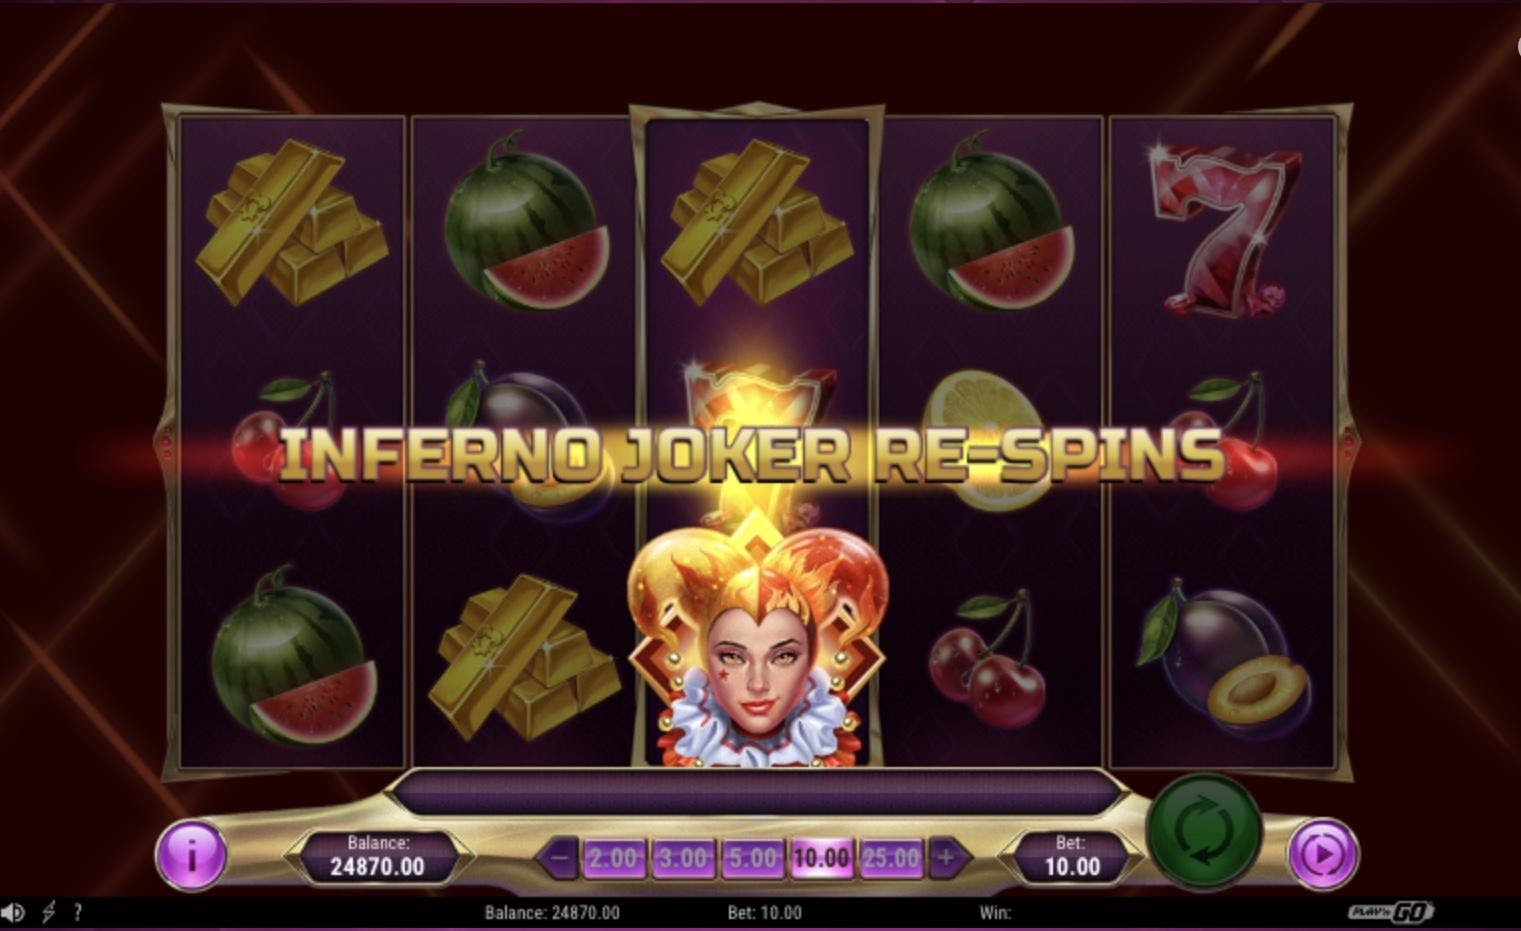 Inferno Jokerのフリースピン獲得画面